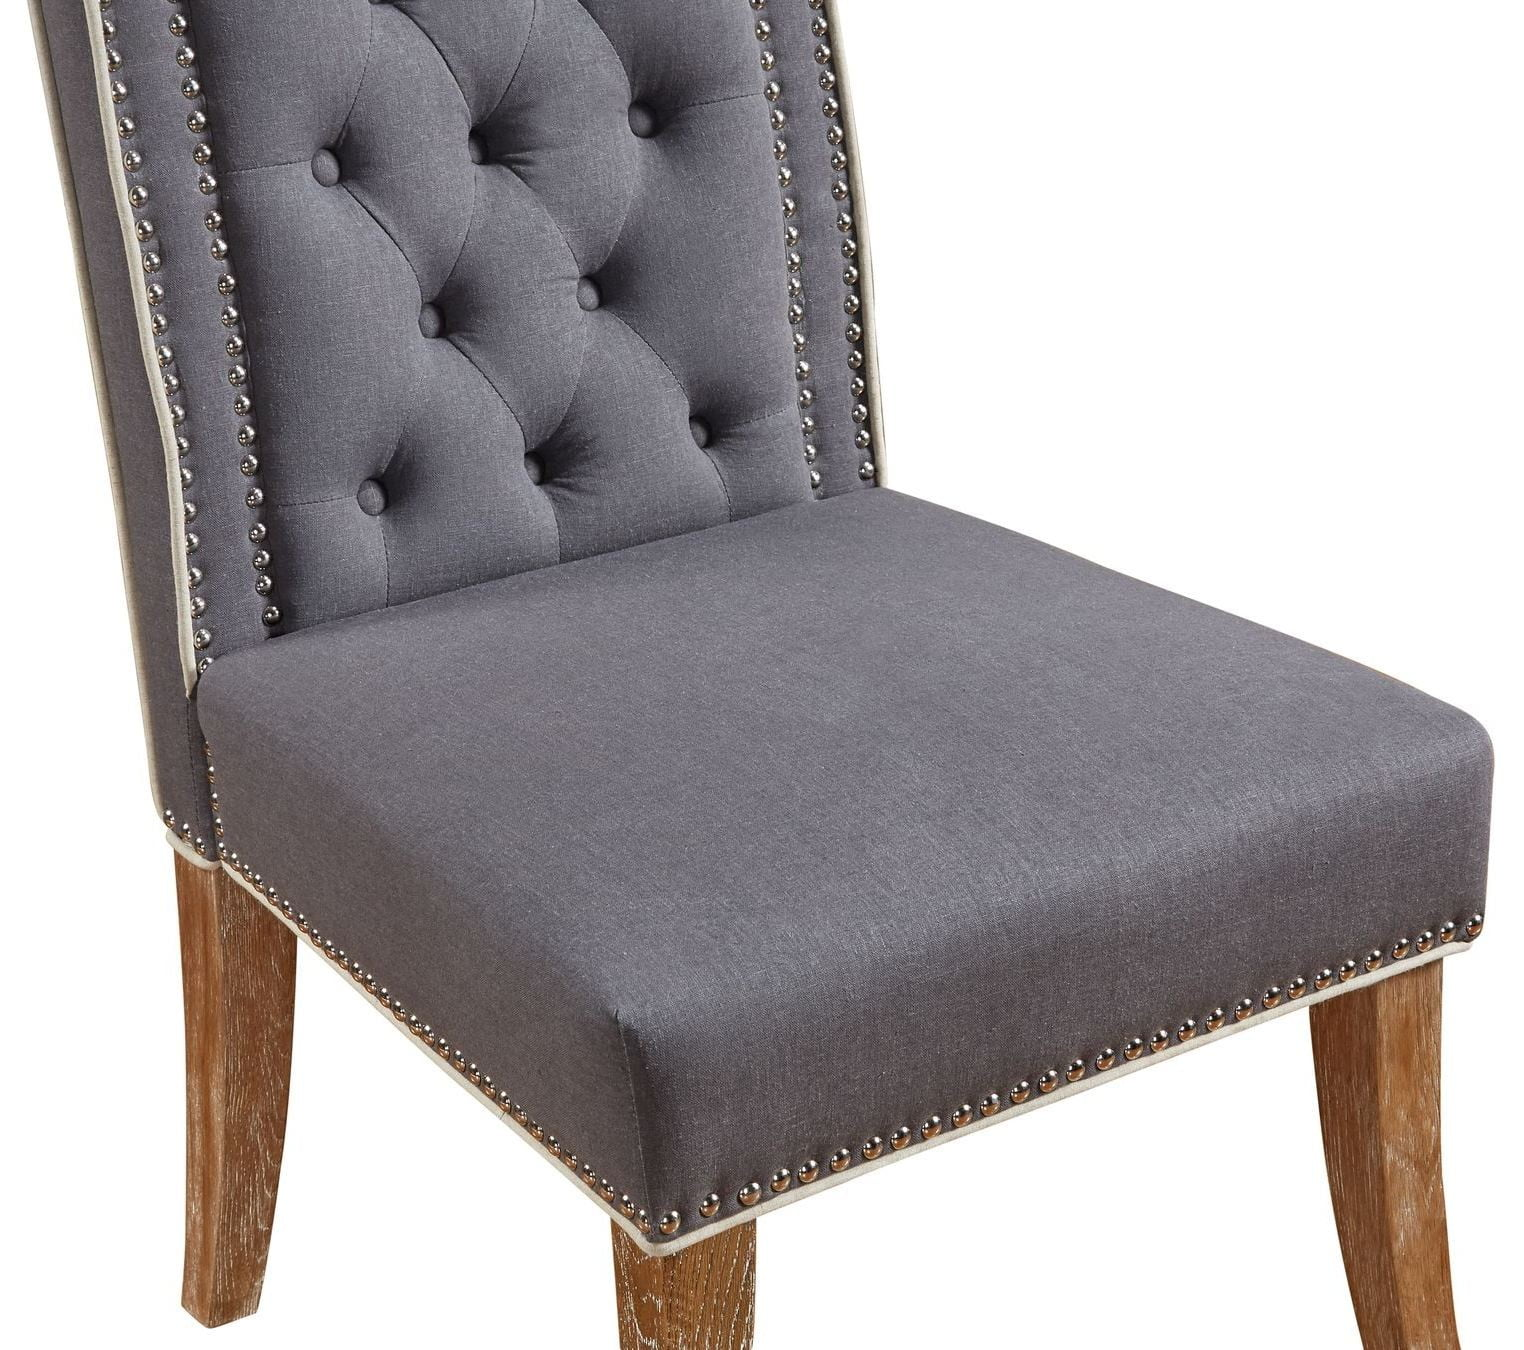 Garrett Grey Linen Dining Chair Set of 2 from TOV